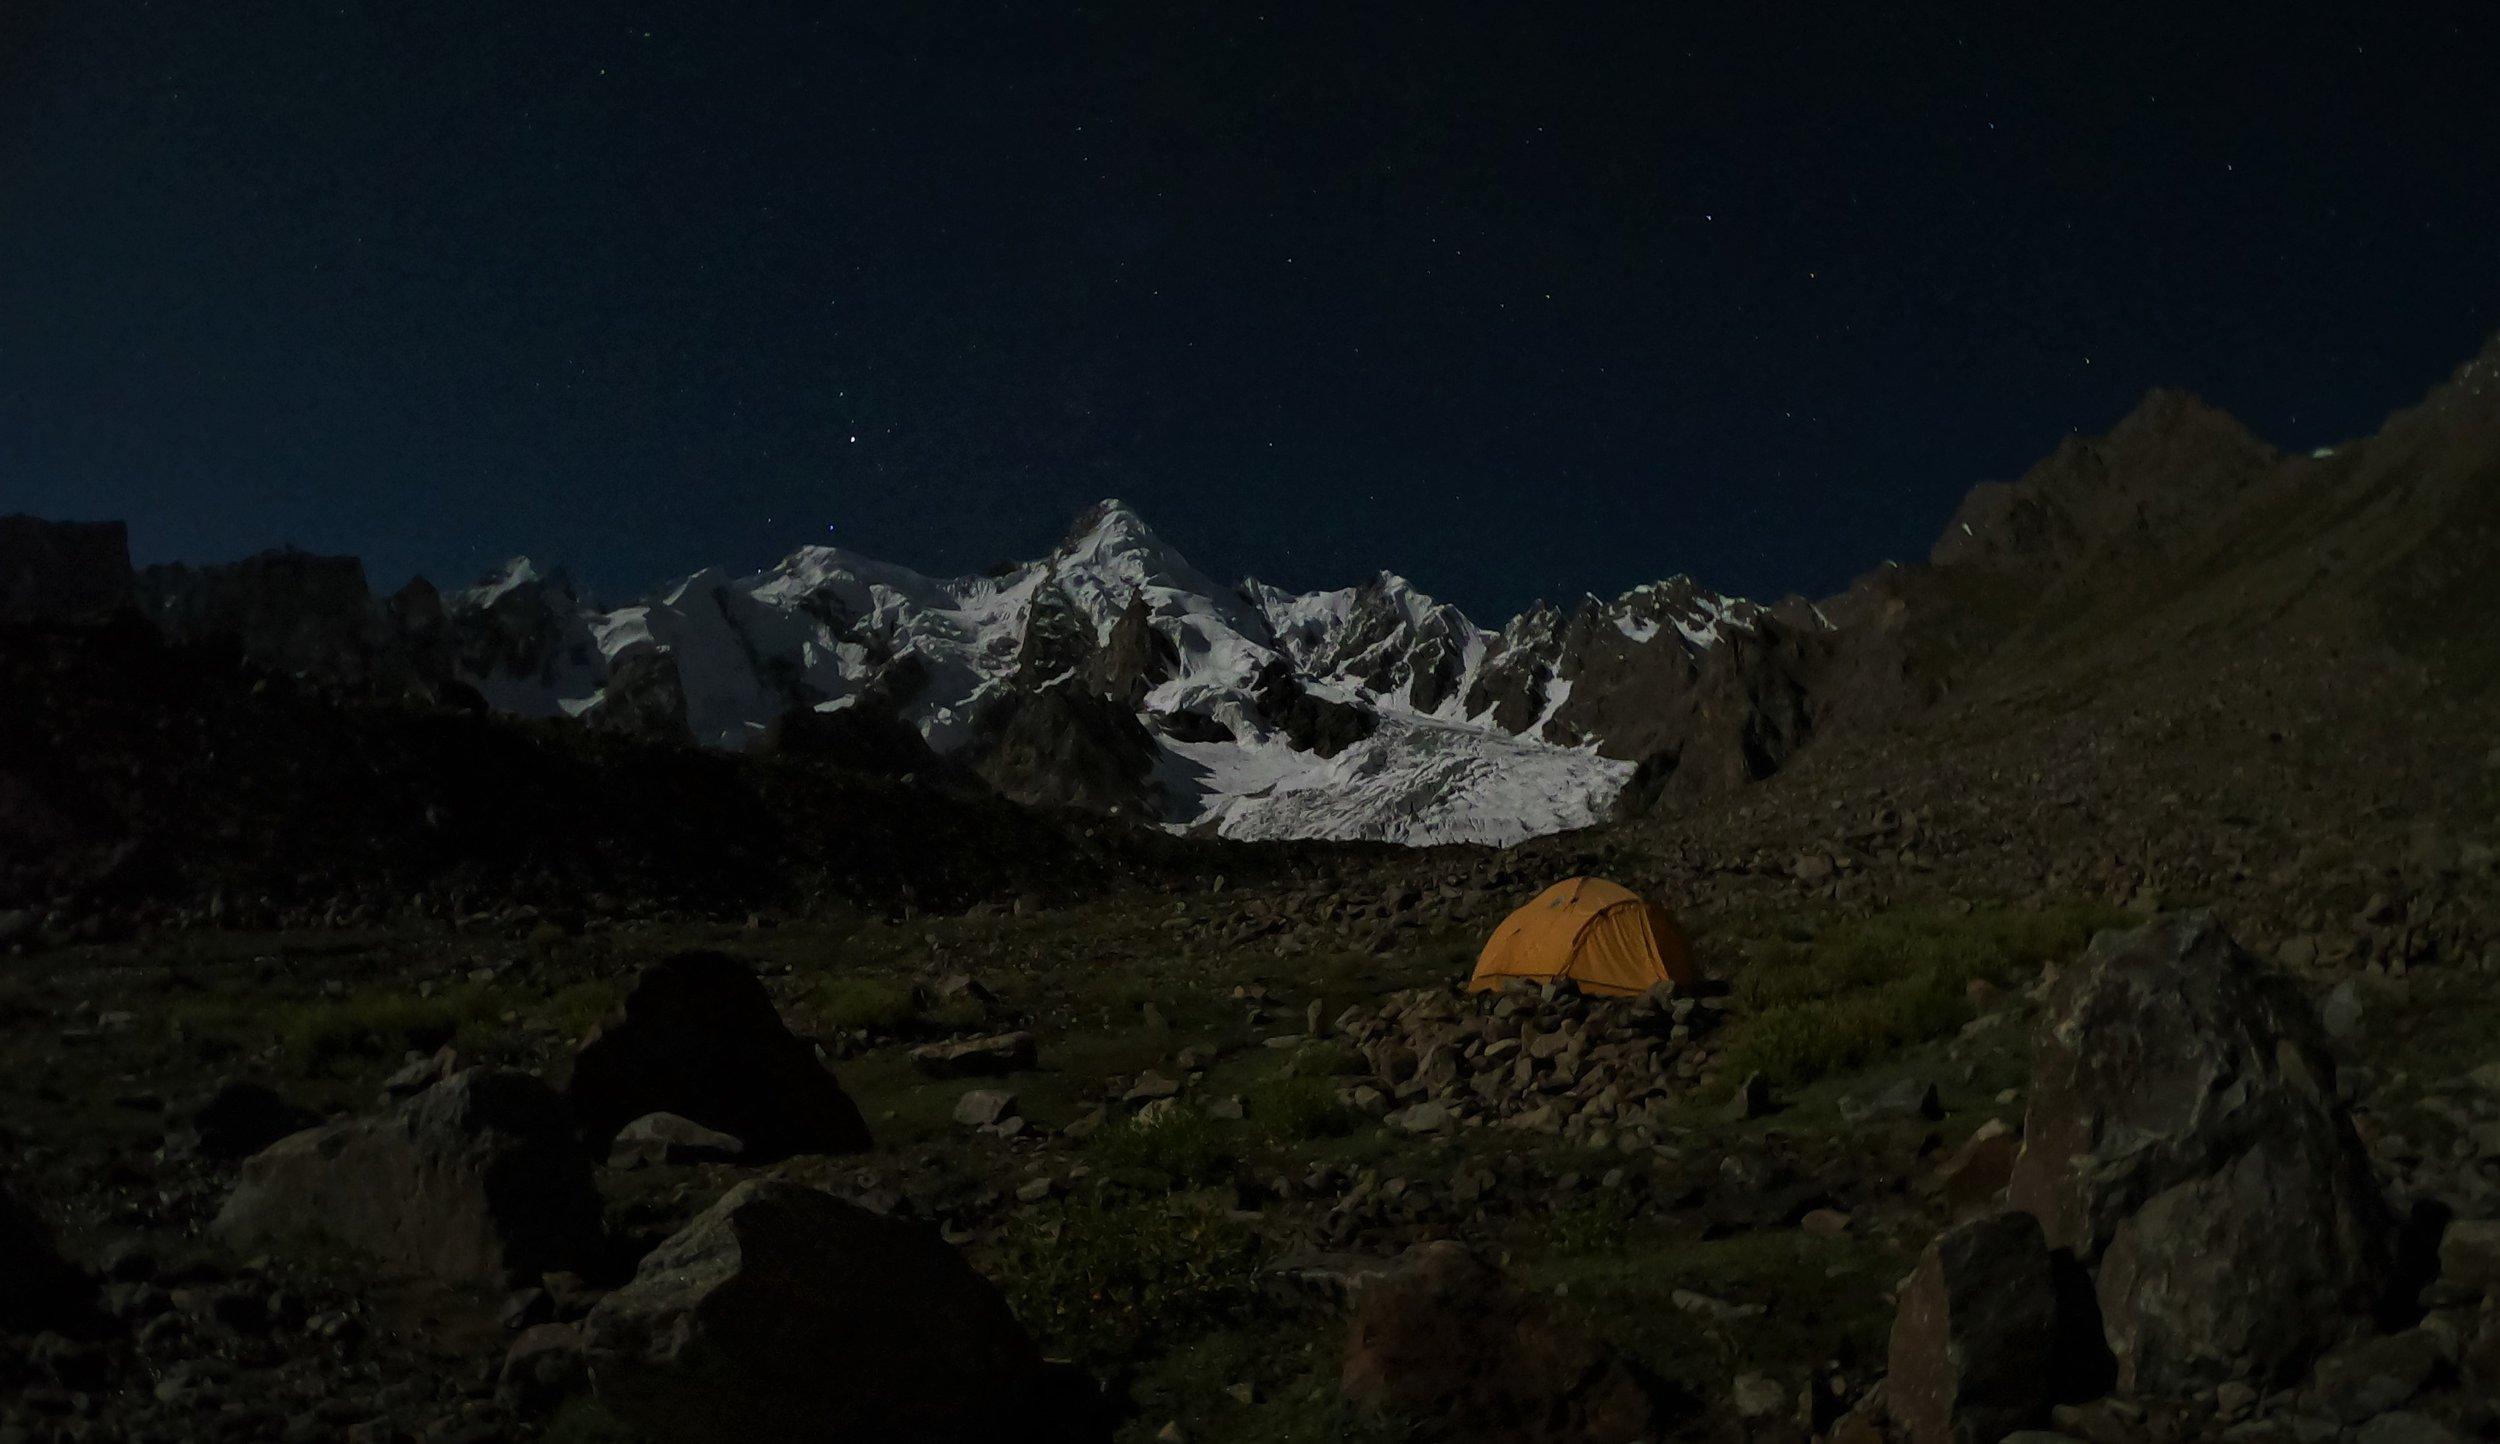 Base camp at Bondit peak under a full moon